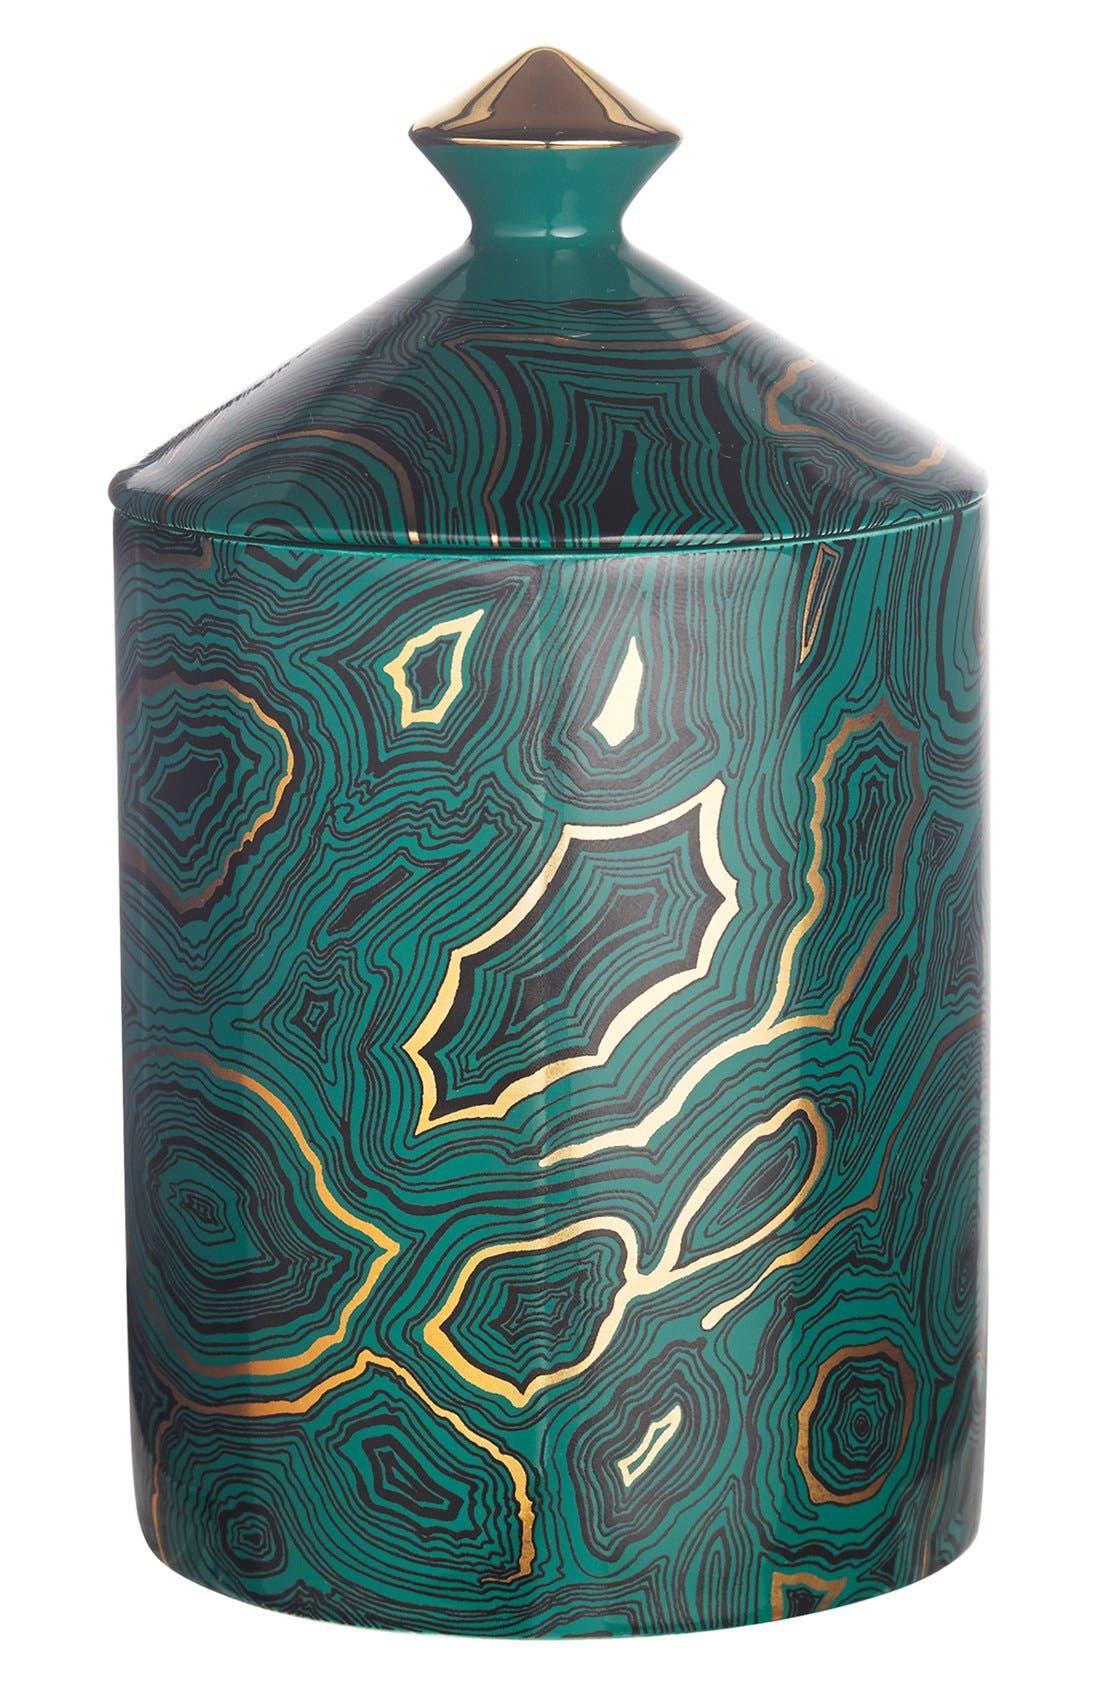 'Malachite' Lidded Candle,                             Main thumbnail 1, color,                             000